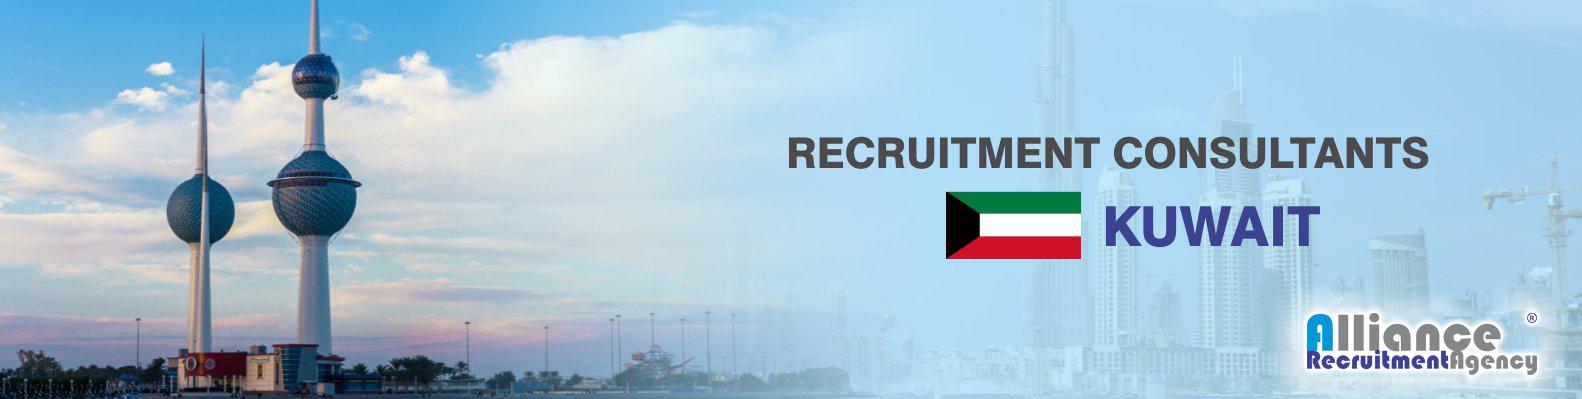 kuwait recruitment consultants